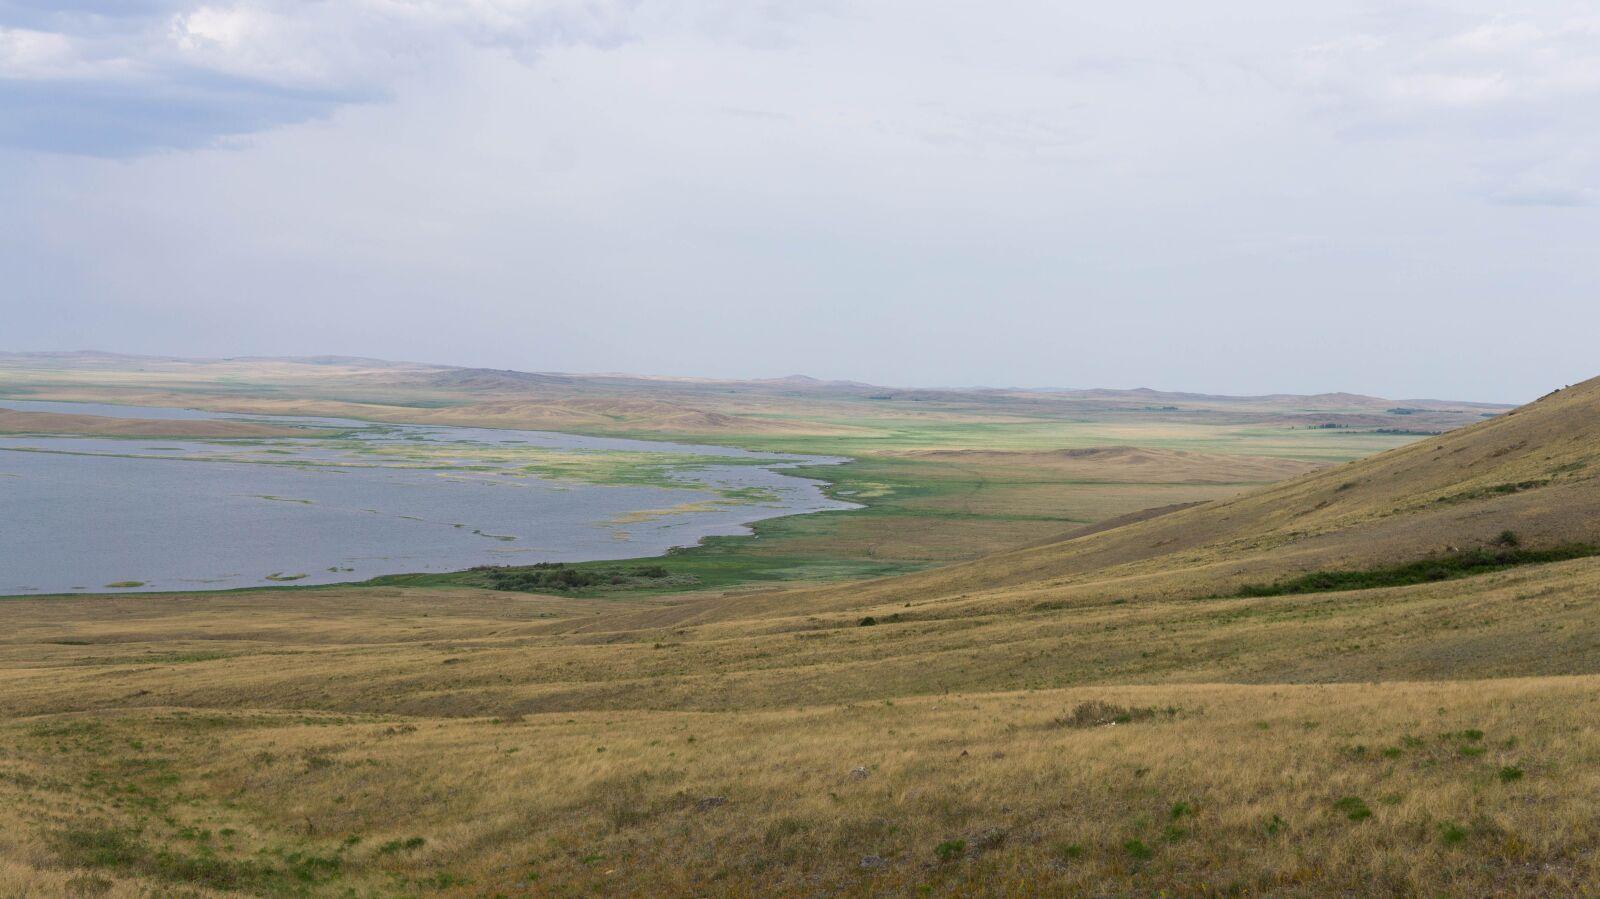 lake, nature, steppe